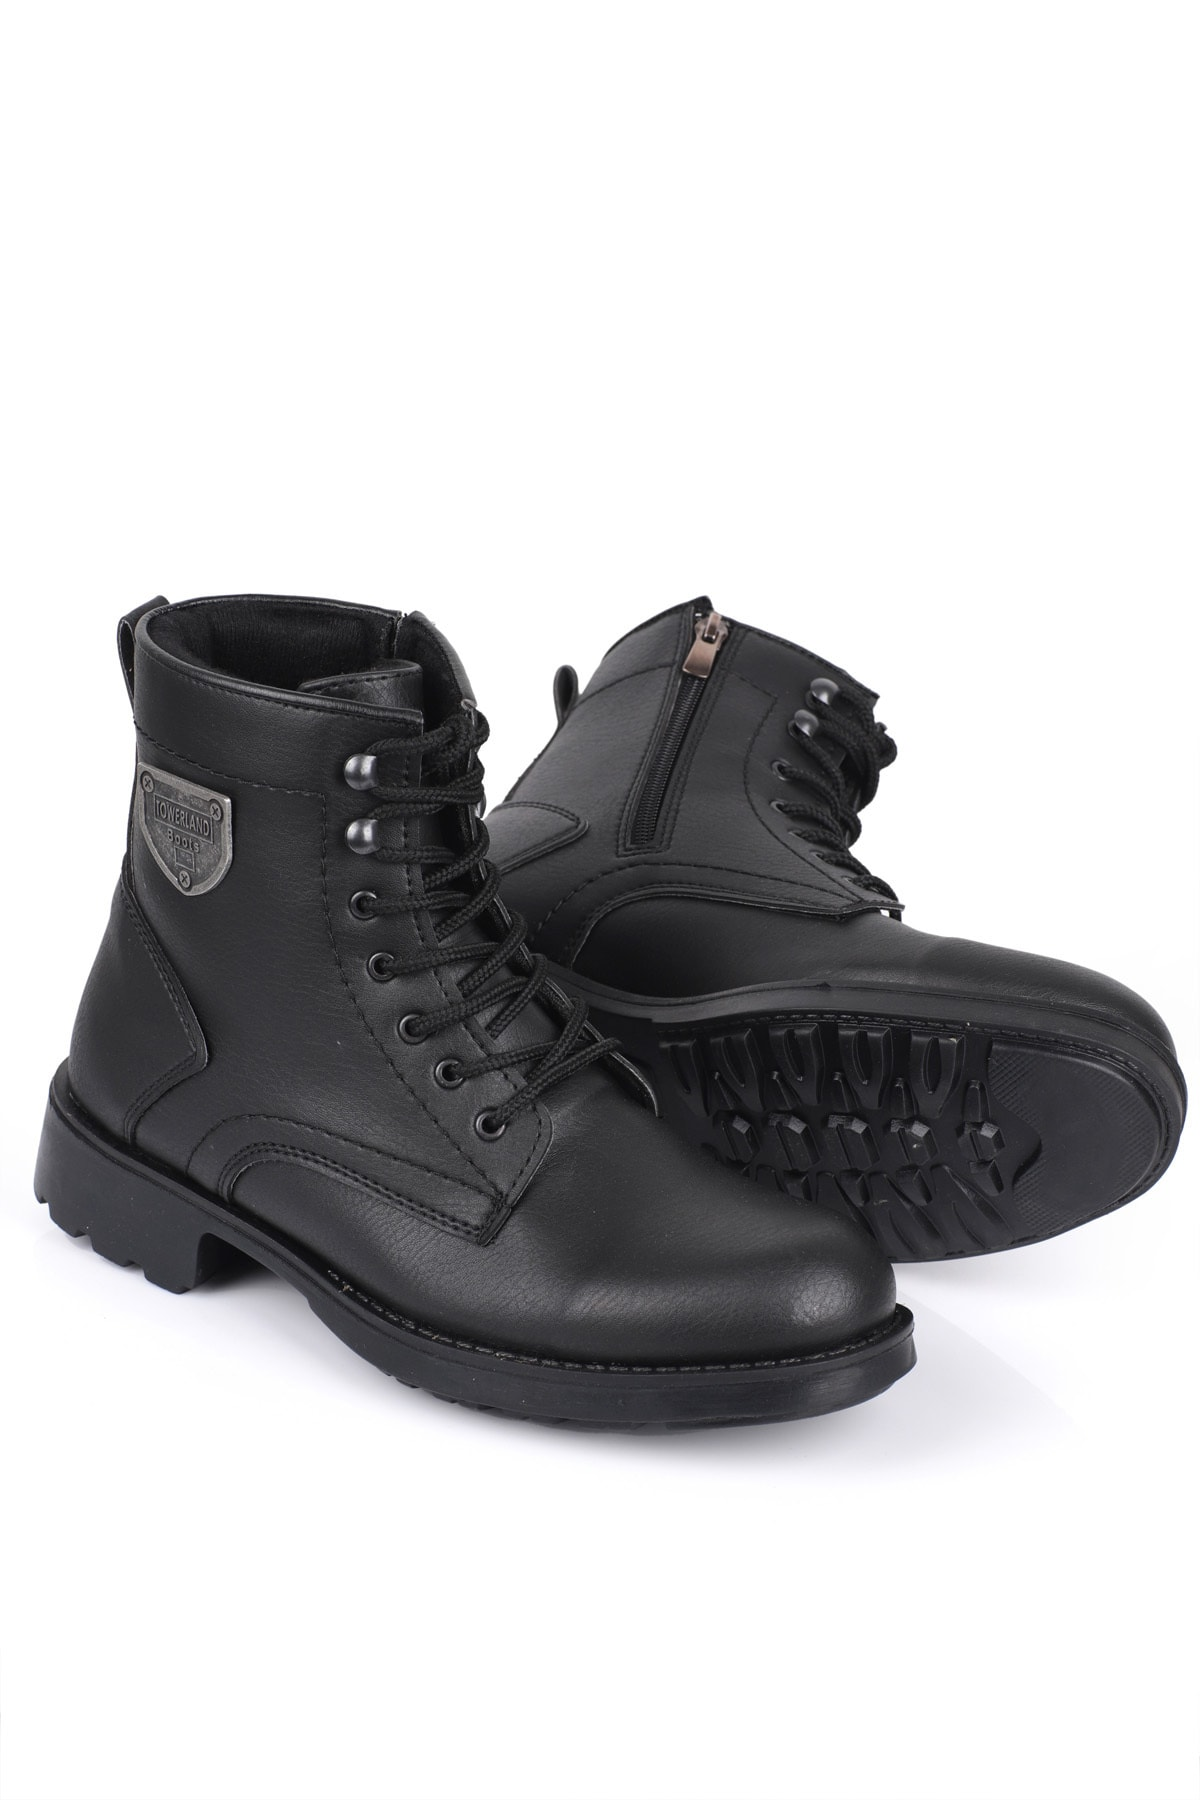 Daxtors Erkek Siyah Kışlık Kar Botu D00655 2